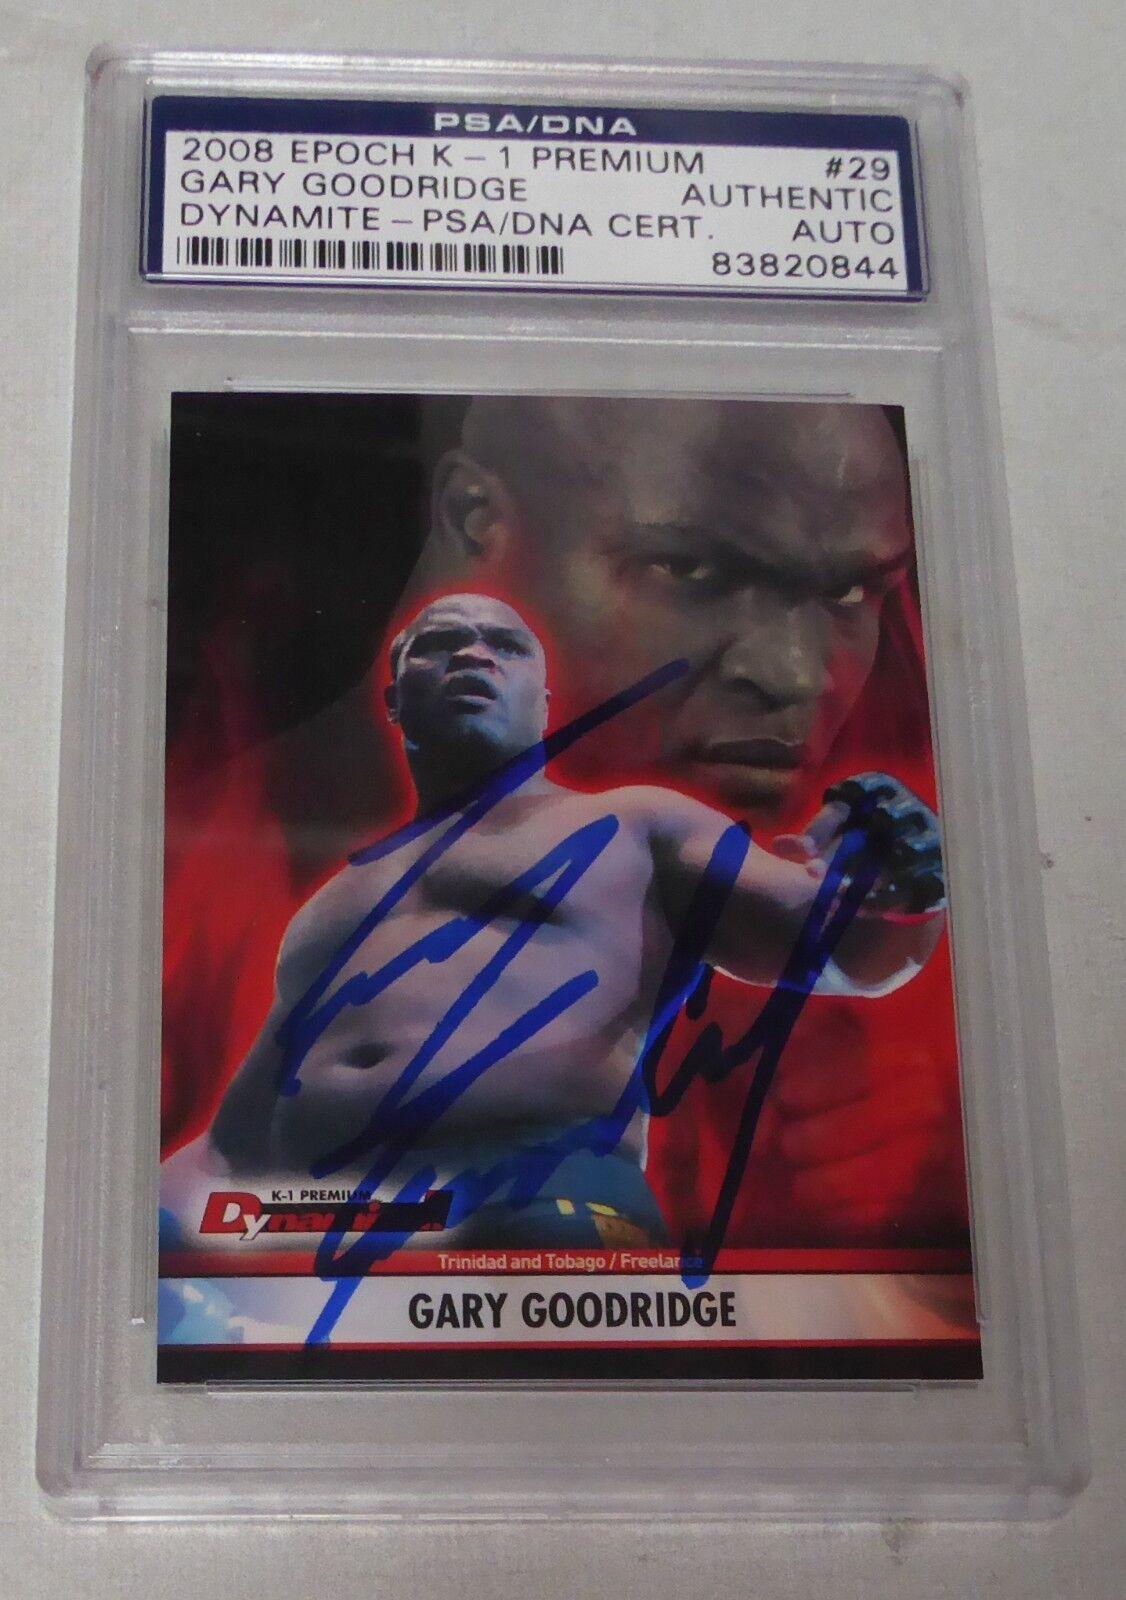 Gary Goodridge Firmado 2008 Epoch K-1 Premium Dynamite Tarjetas PSA DNA UFC 8